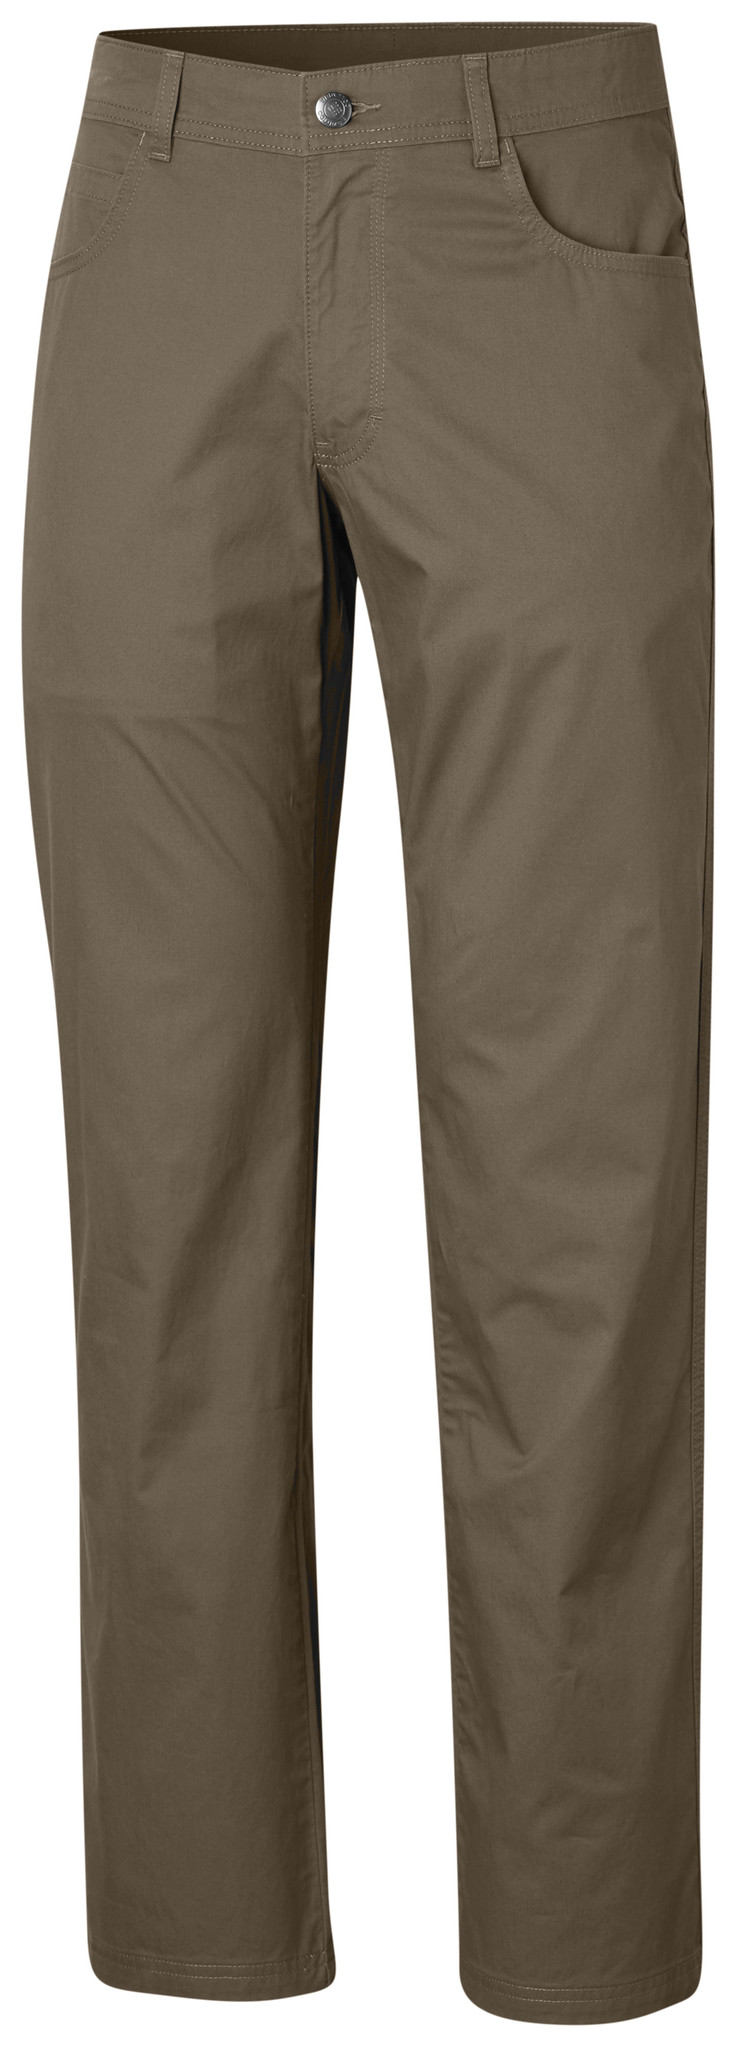 Columbia Sportswear Rapid Rivers Pant